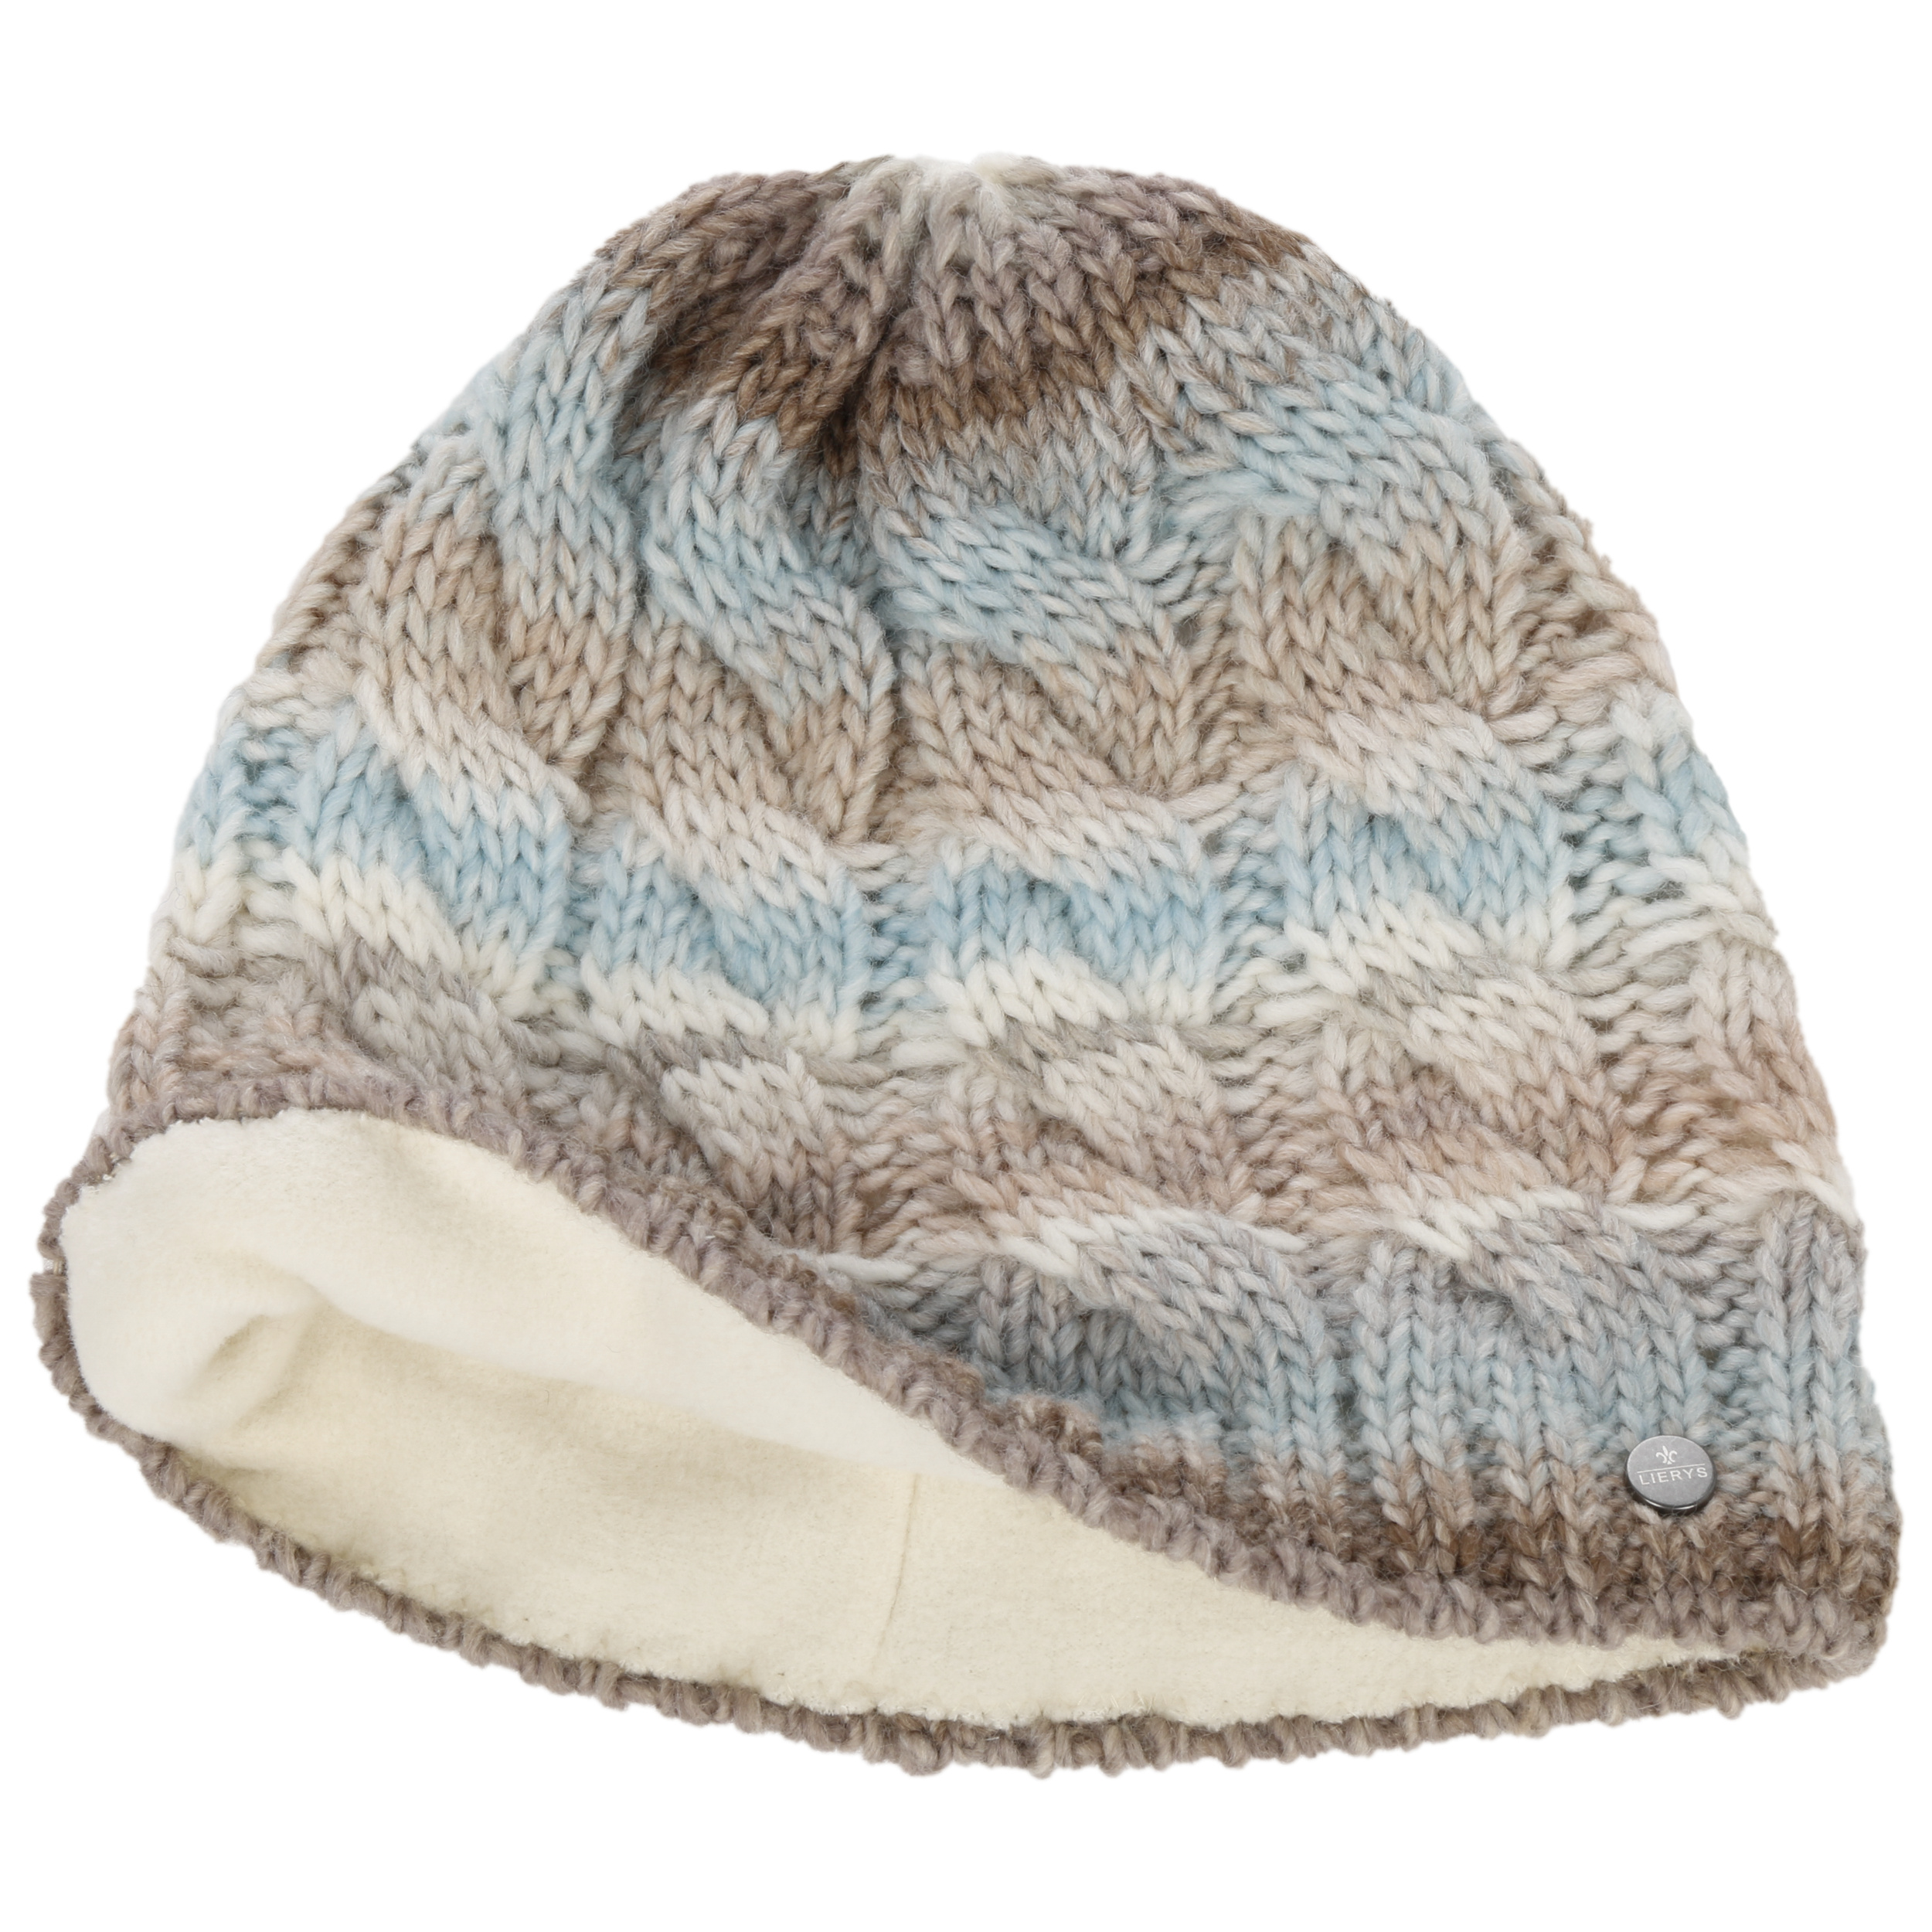 ... Filippa Cable Knit Hat by Lierys - light blue 1 ... c369daff0fa